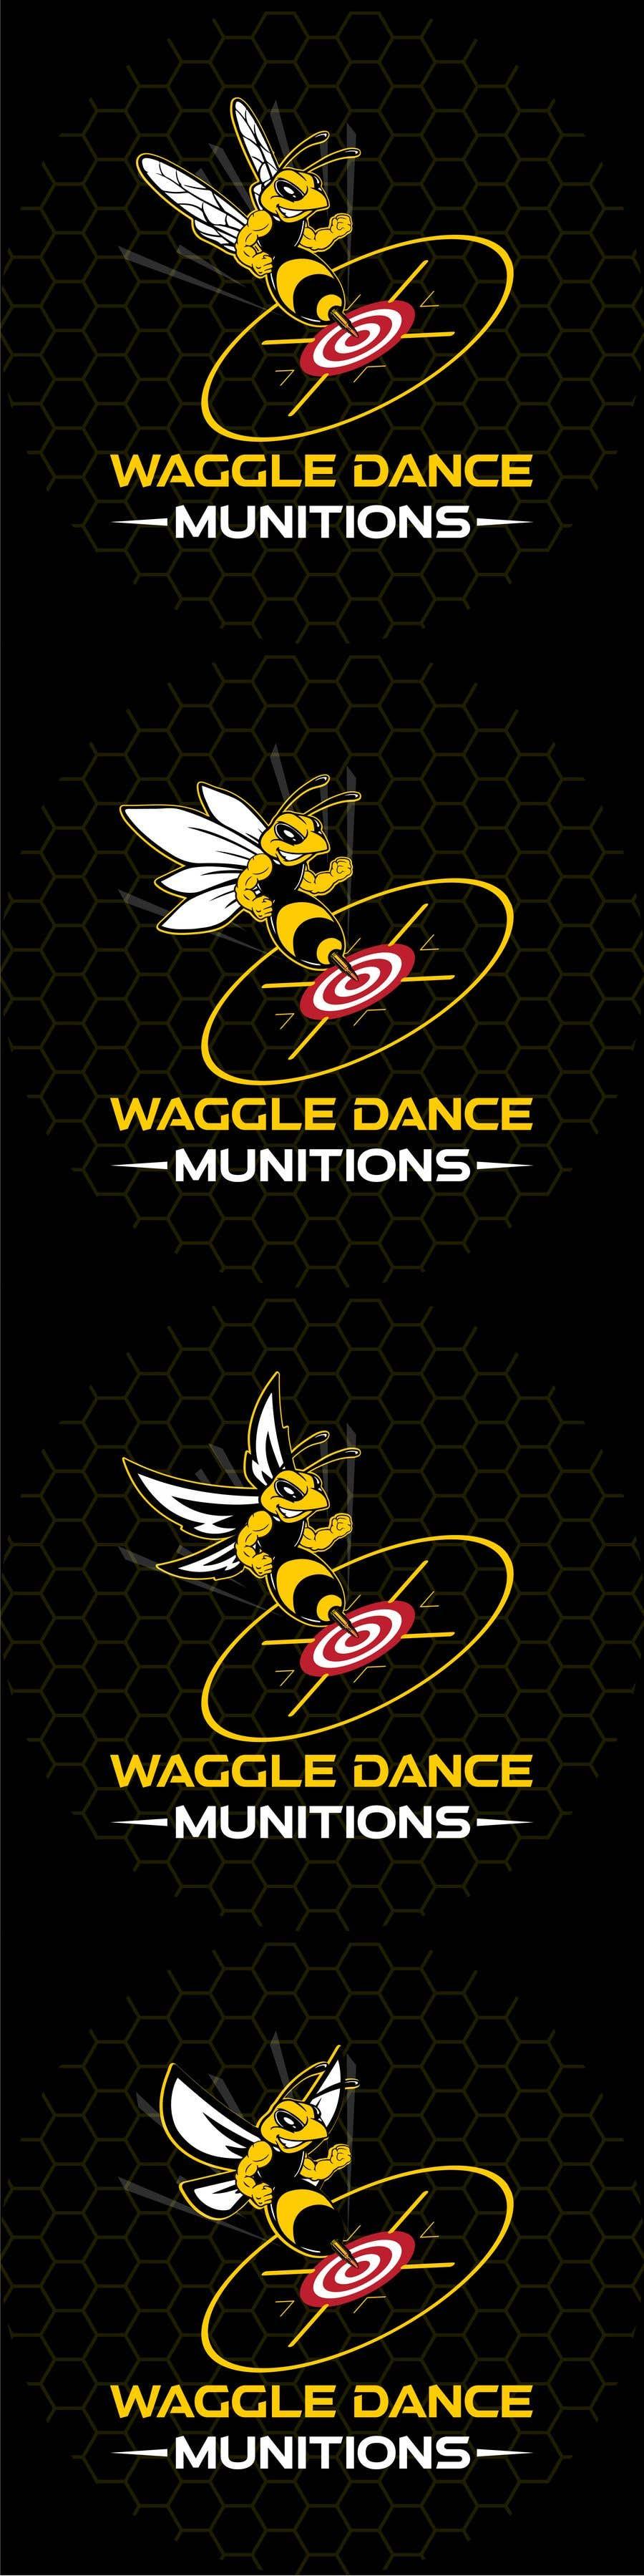 Konkurrenceindlæg #                                        147                                      for                                         Waggle dance logo